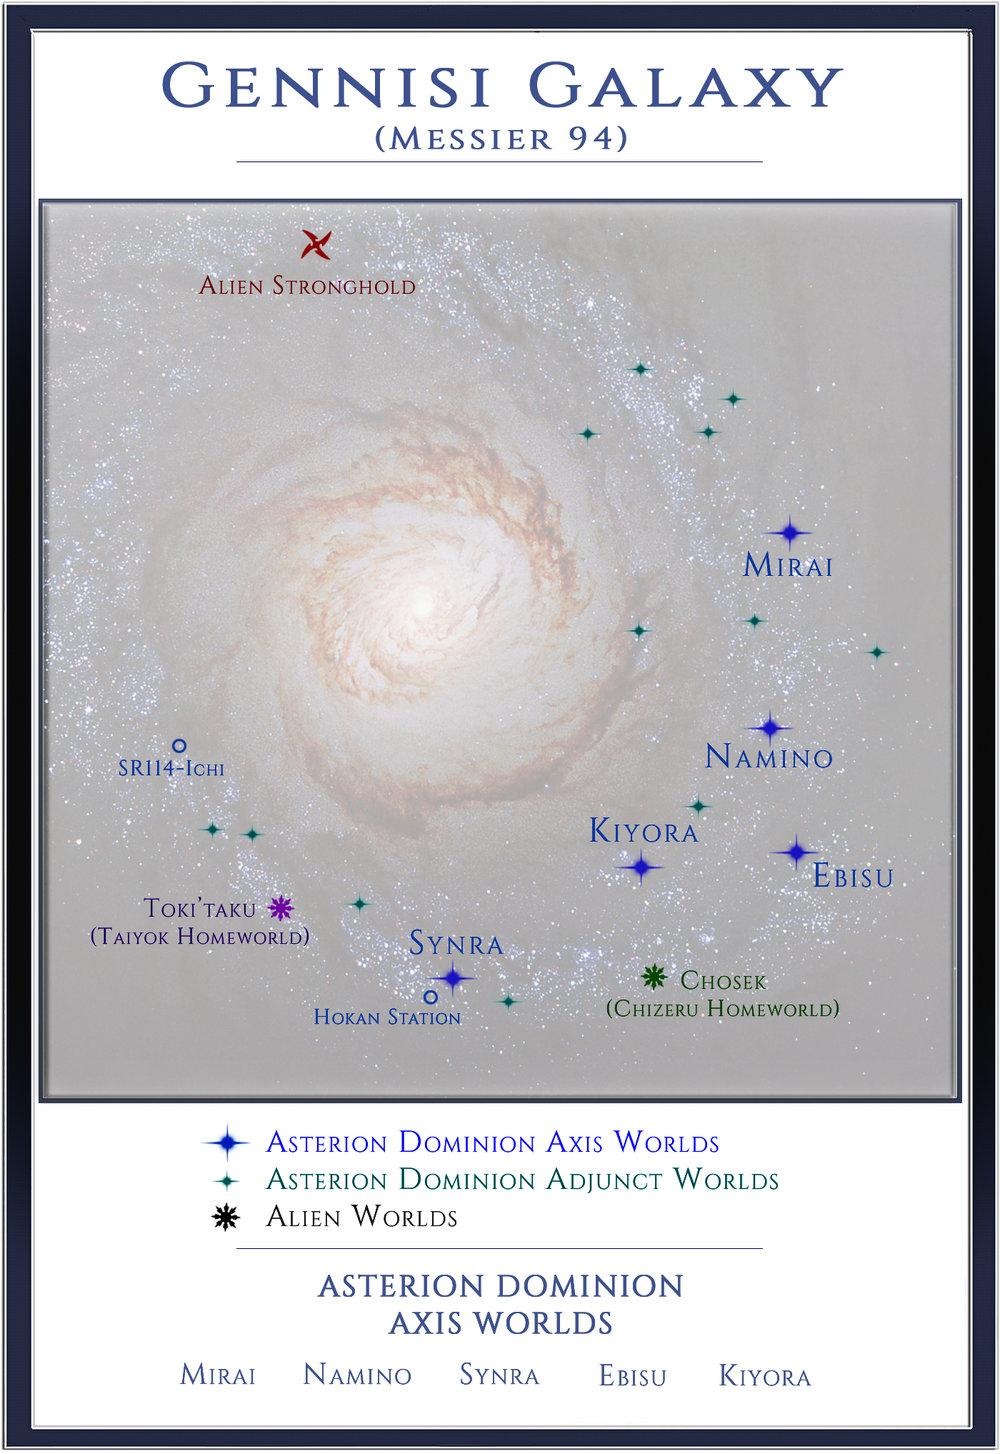 EXIN EX MACHINA: Gennisi Galaxy Map